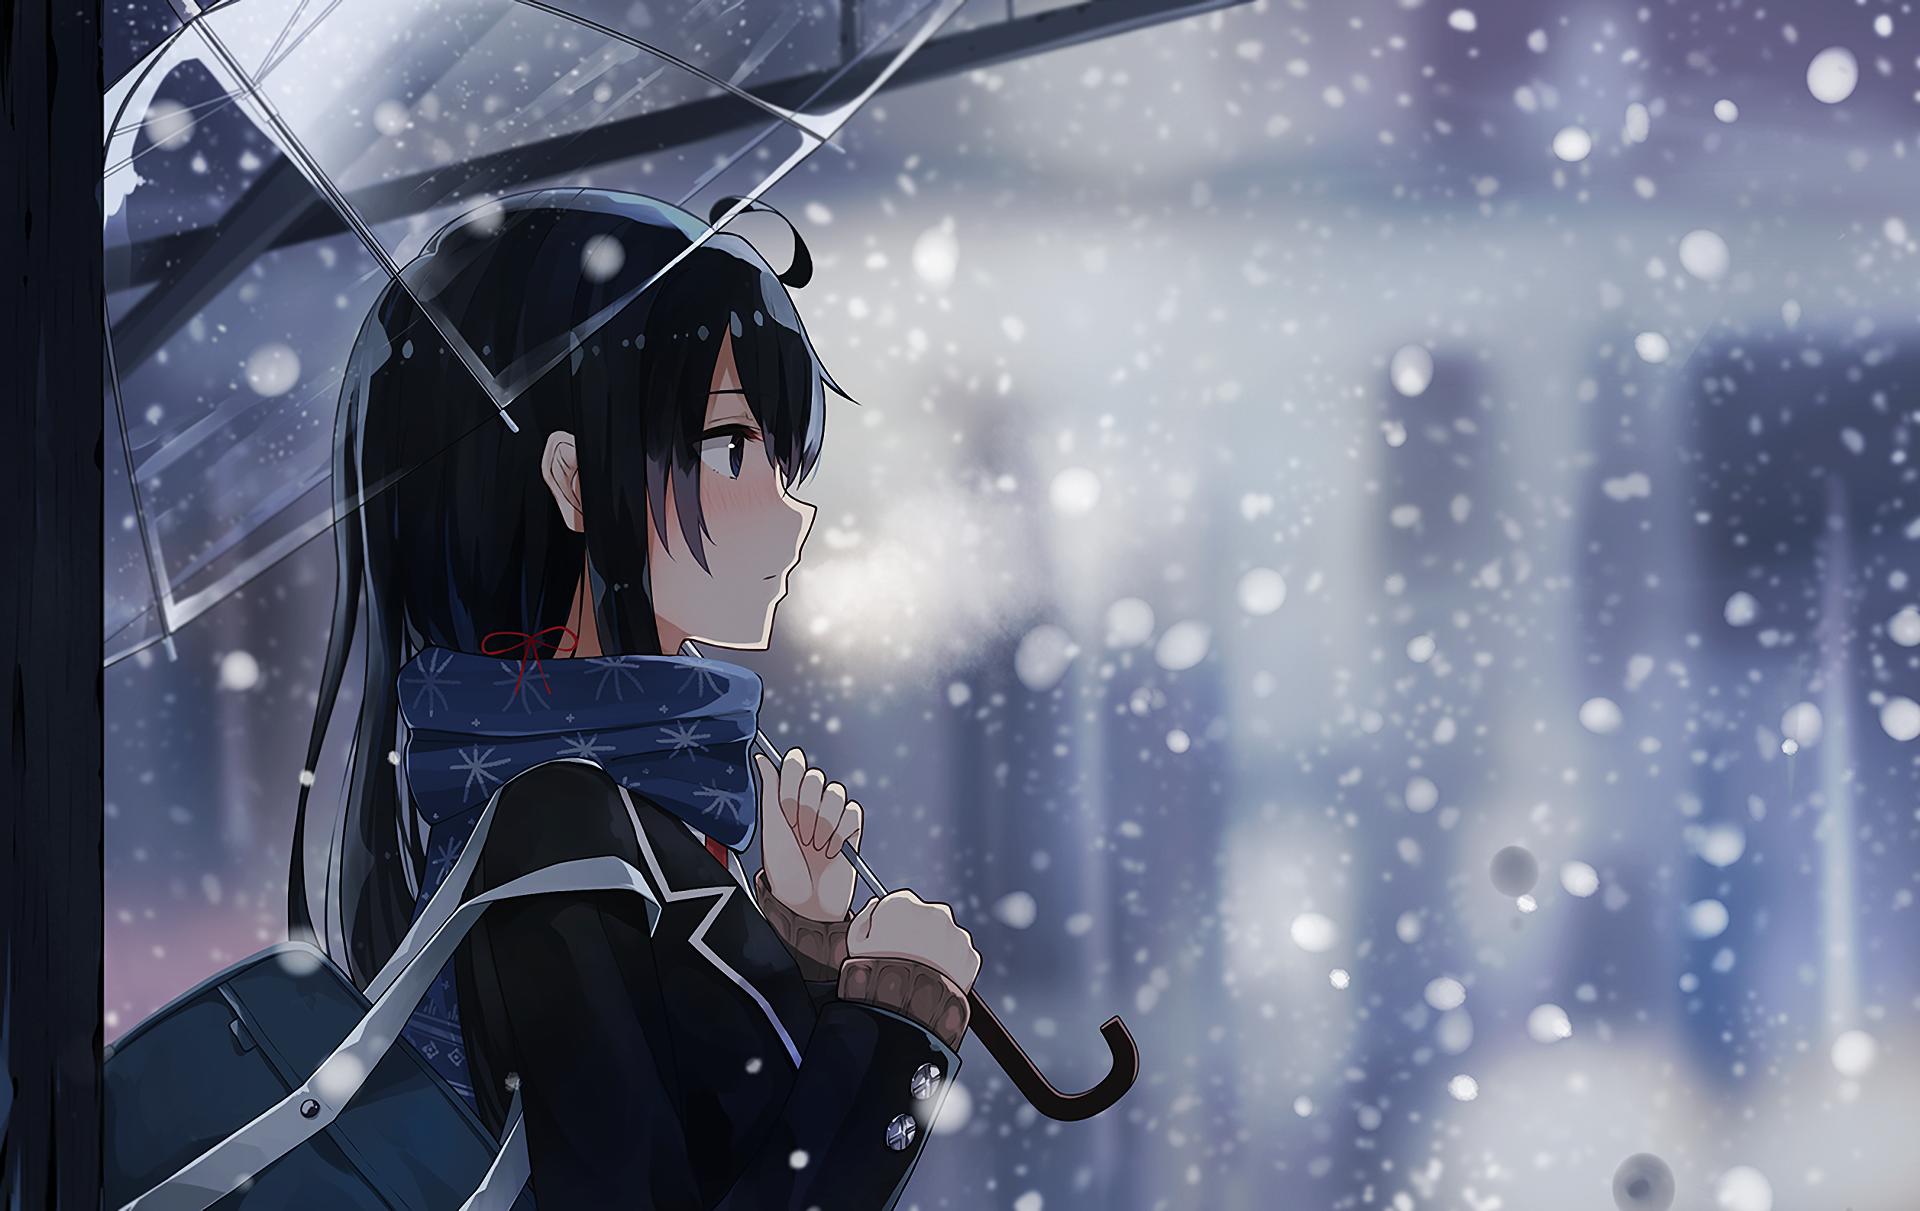 91 yukino yukinoshita hd wallpapers backgrounds - Winter anime girl wallpaper ...